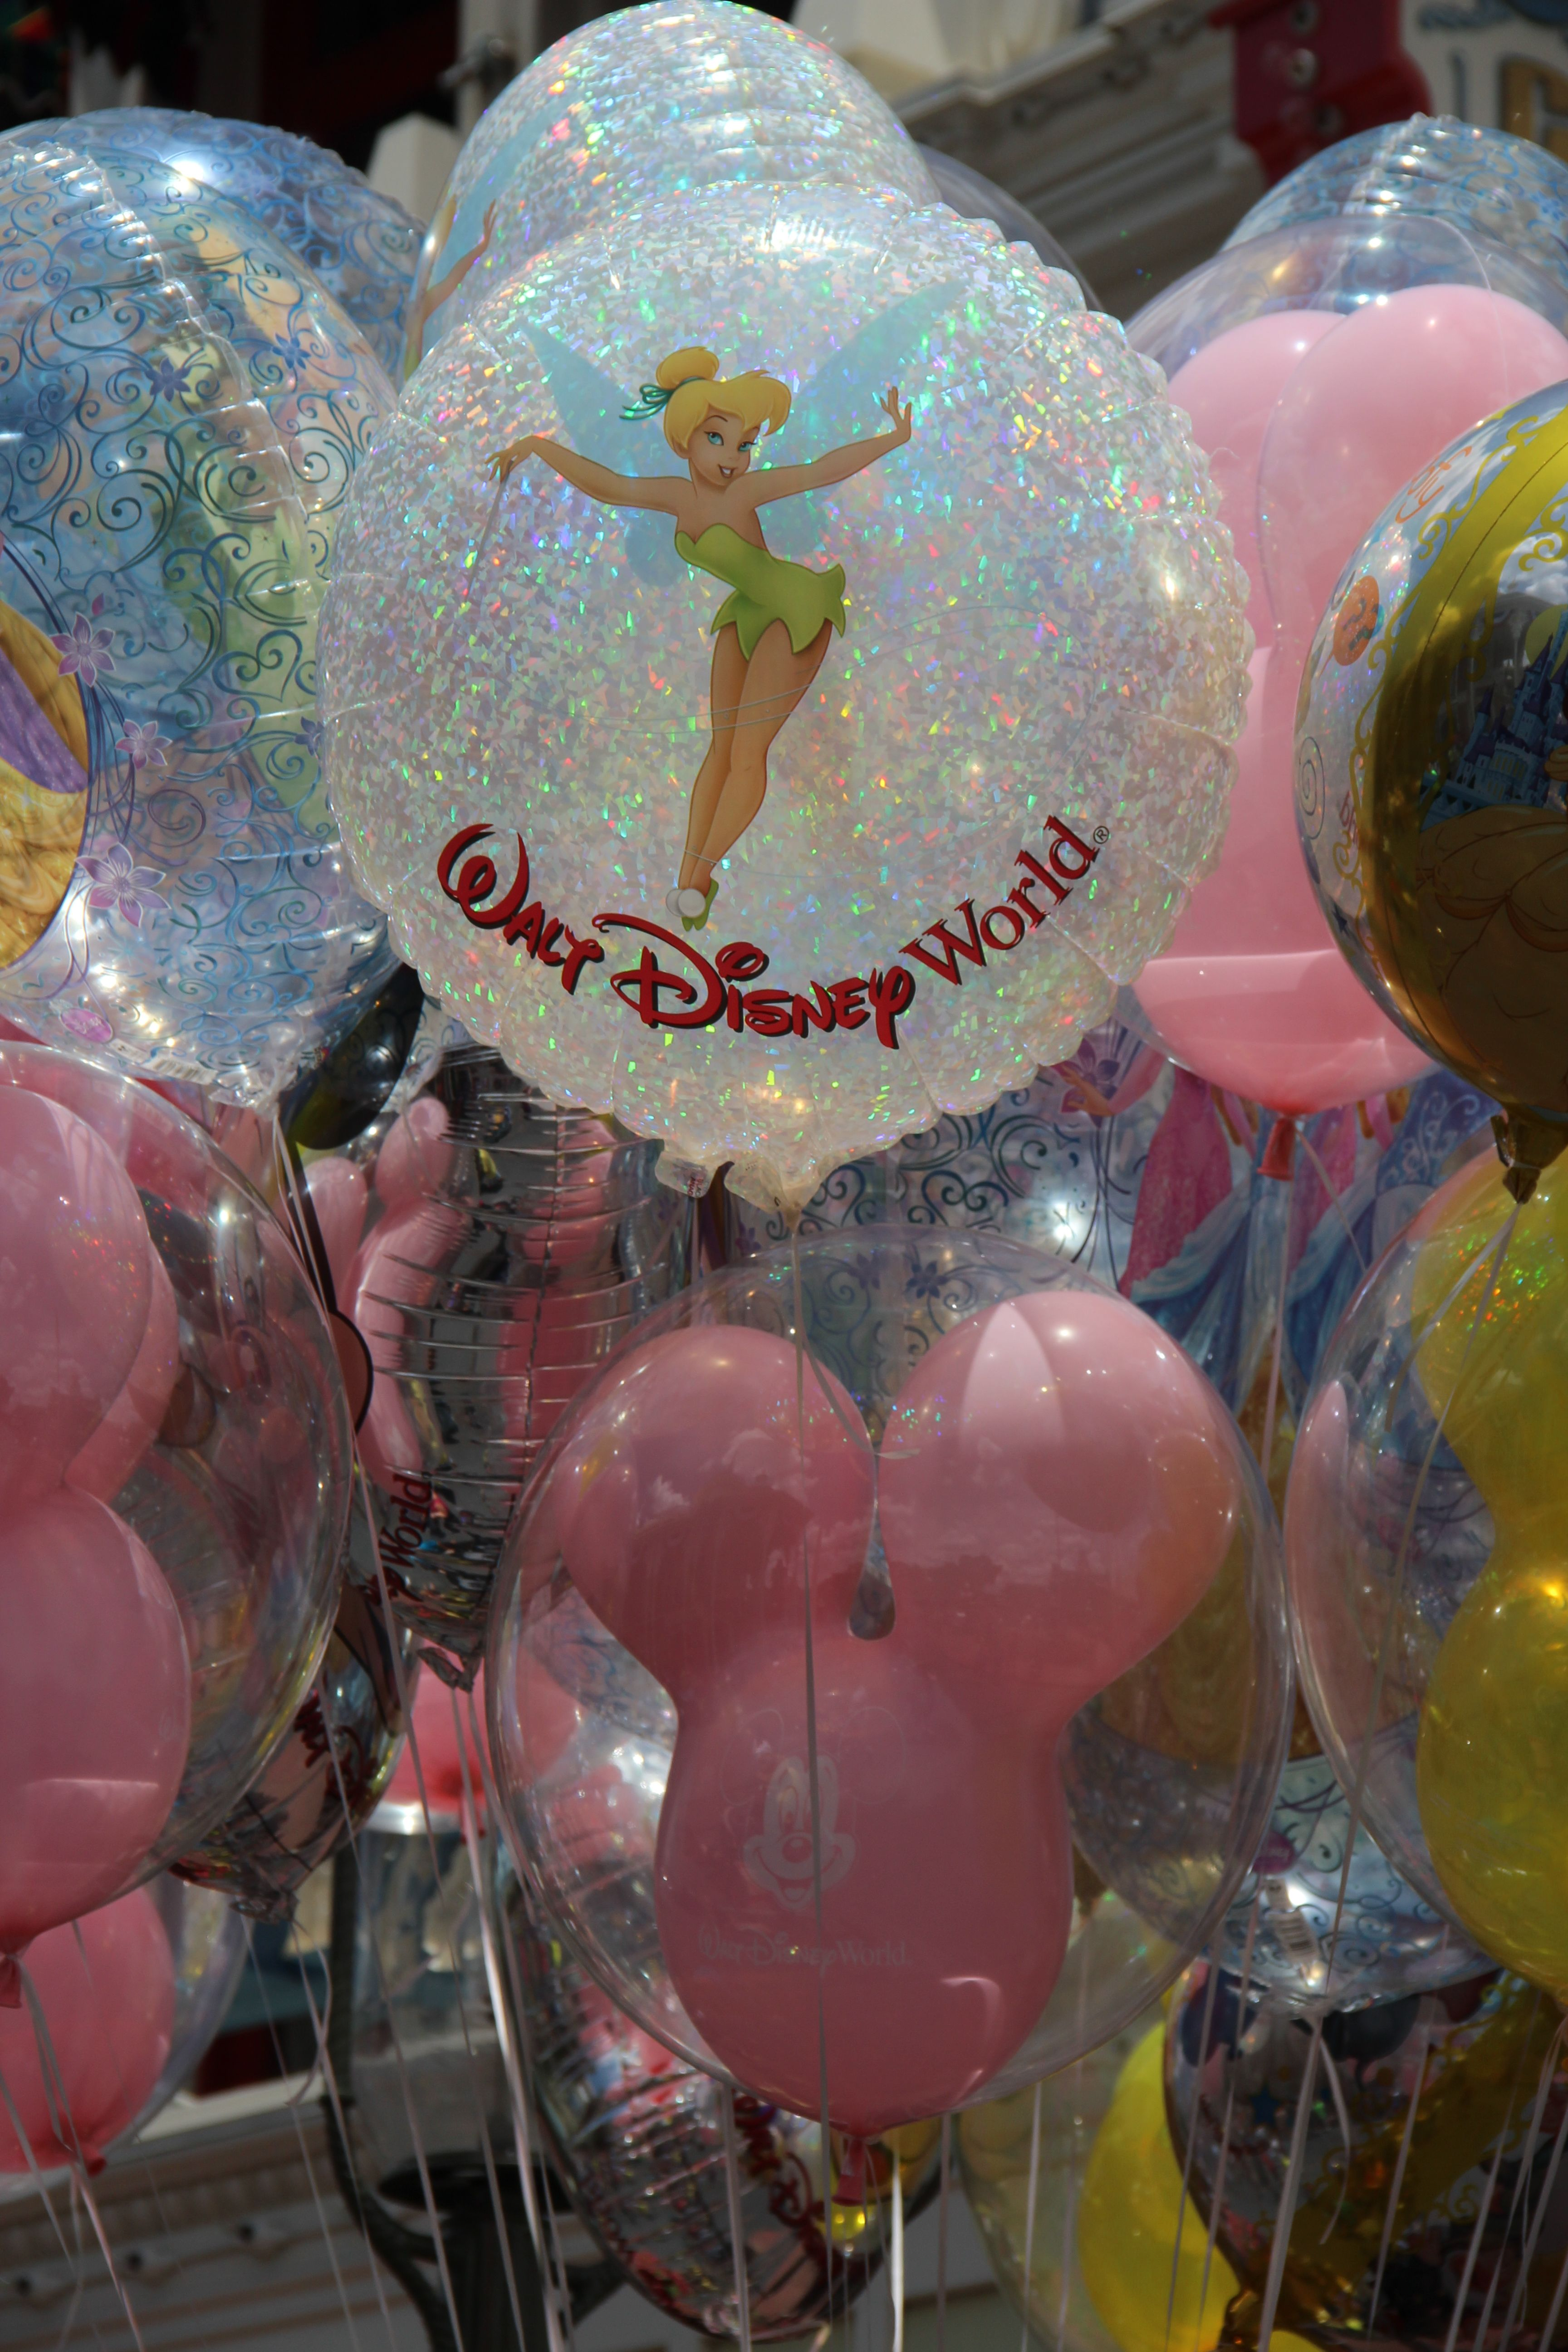 Balloons Walt Disney World by Jenniffer Thomas